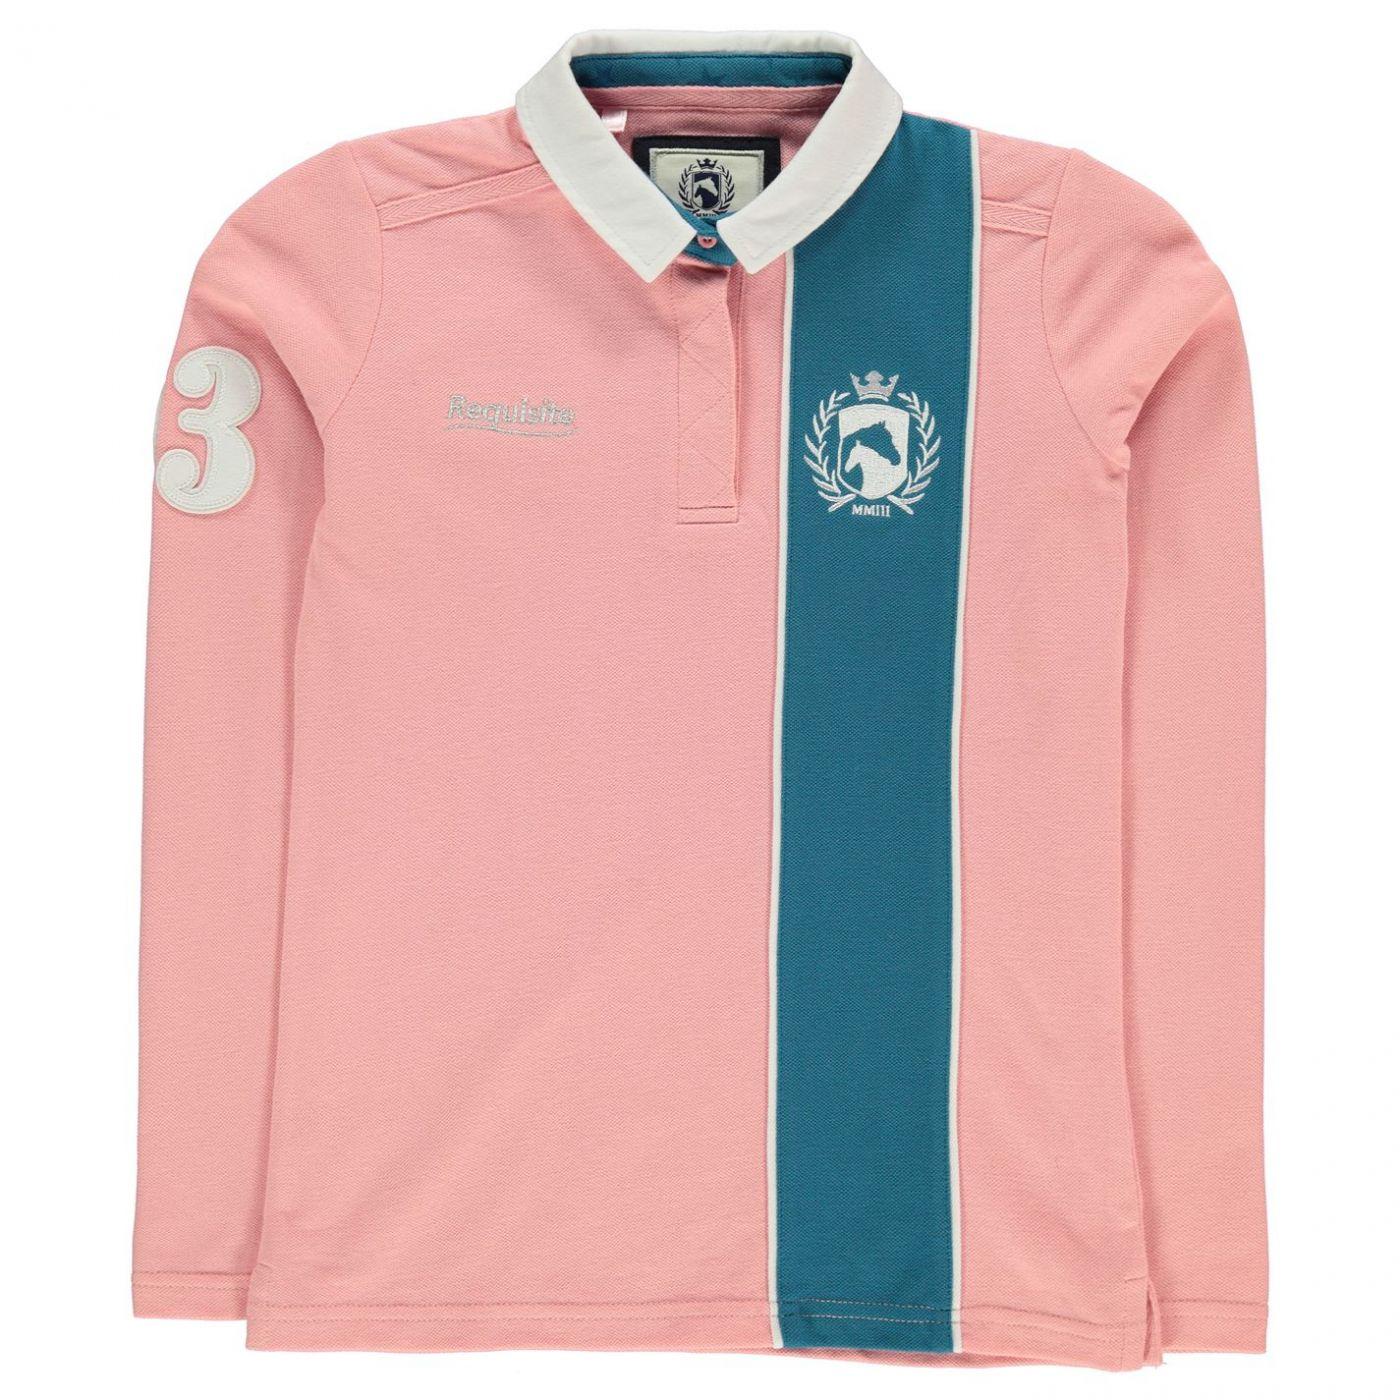 Requisite Girls Long Sleeve Polo Shirt